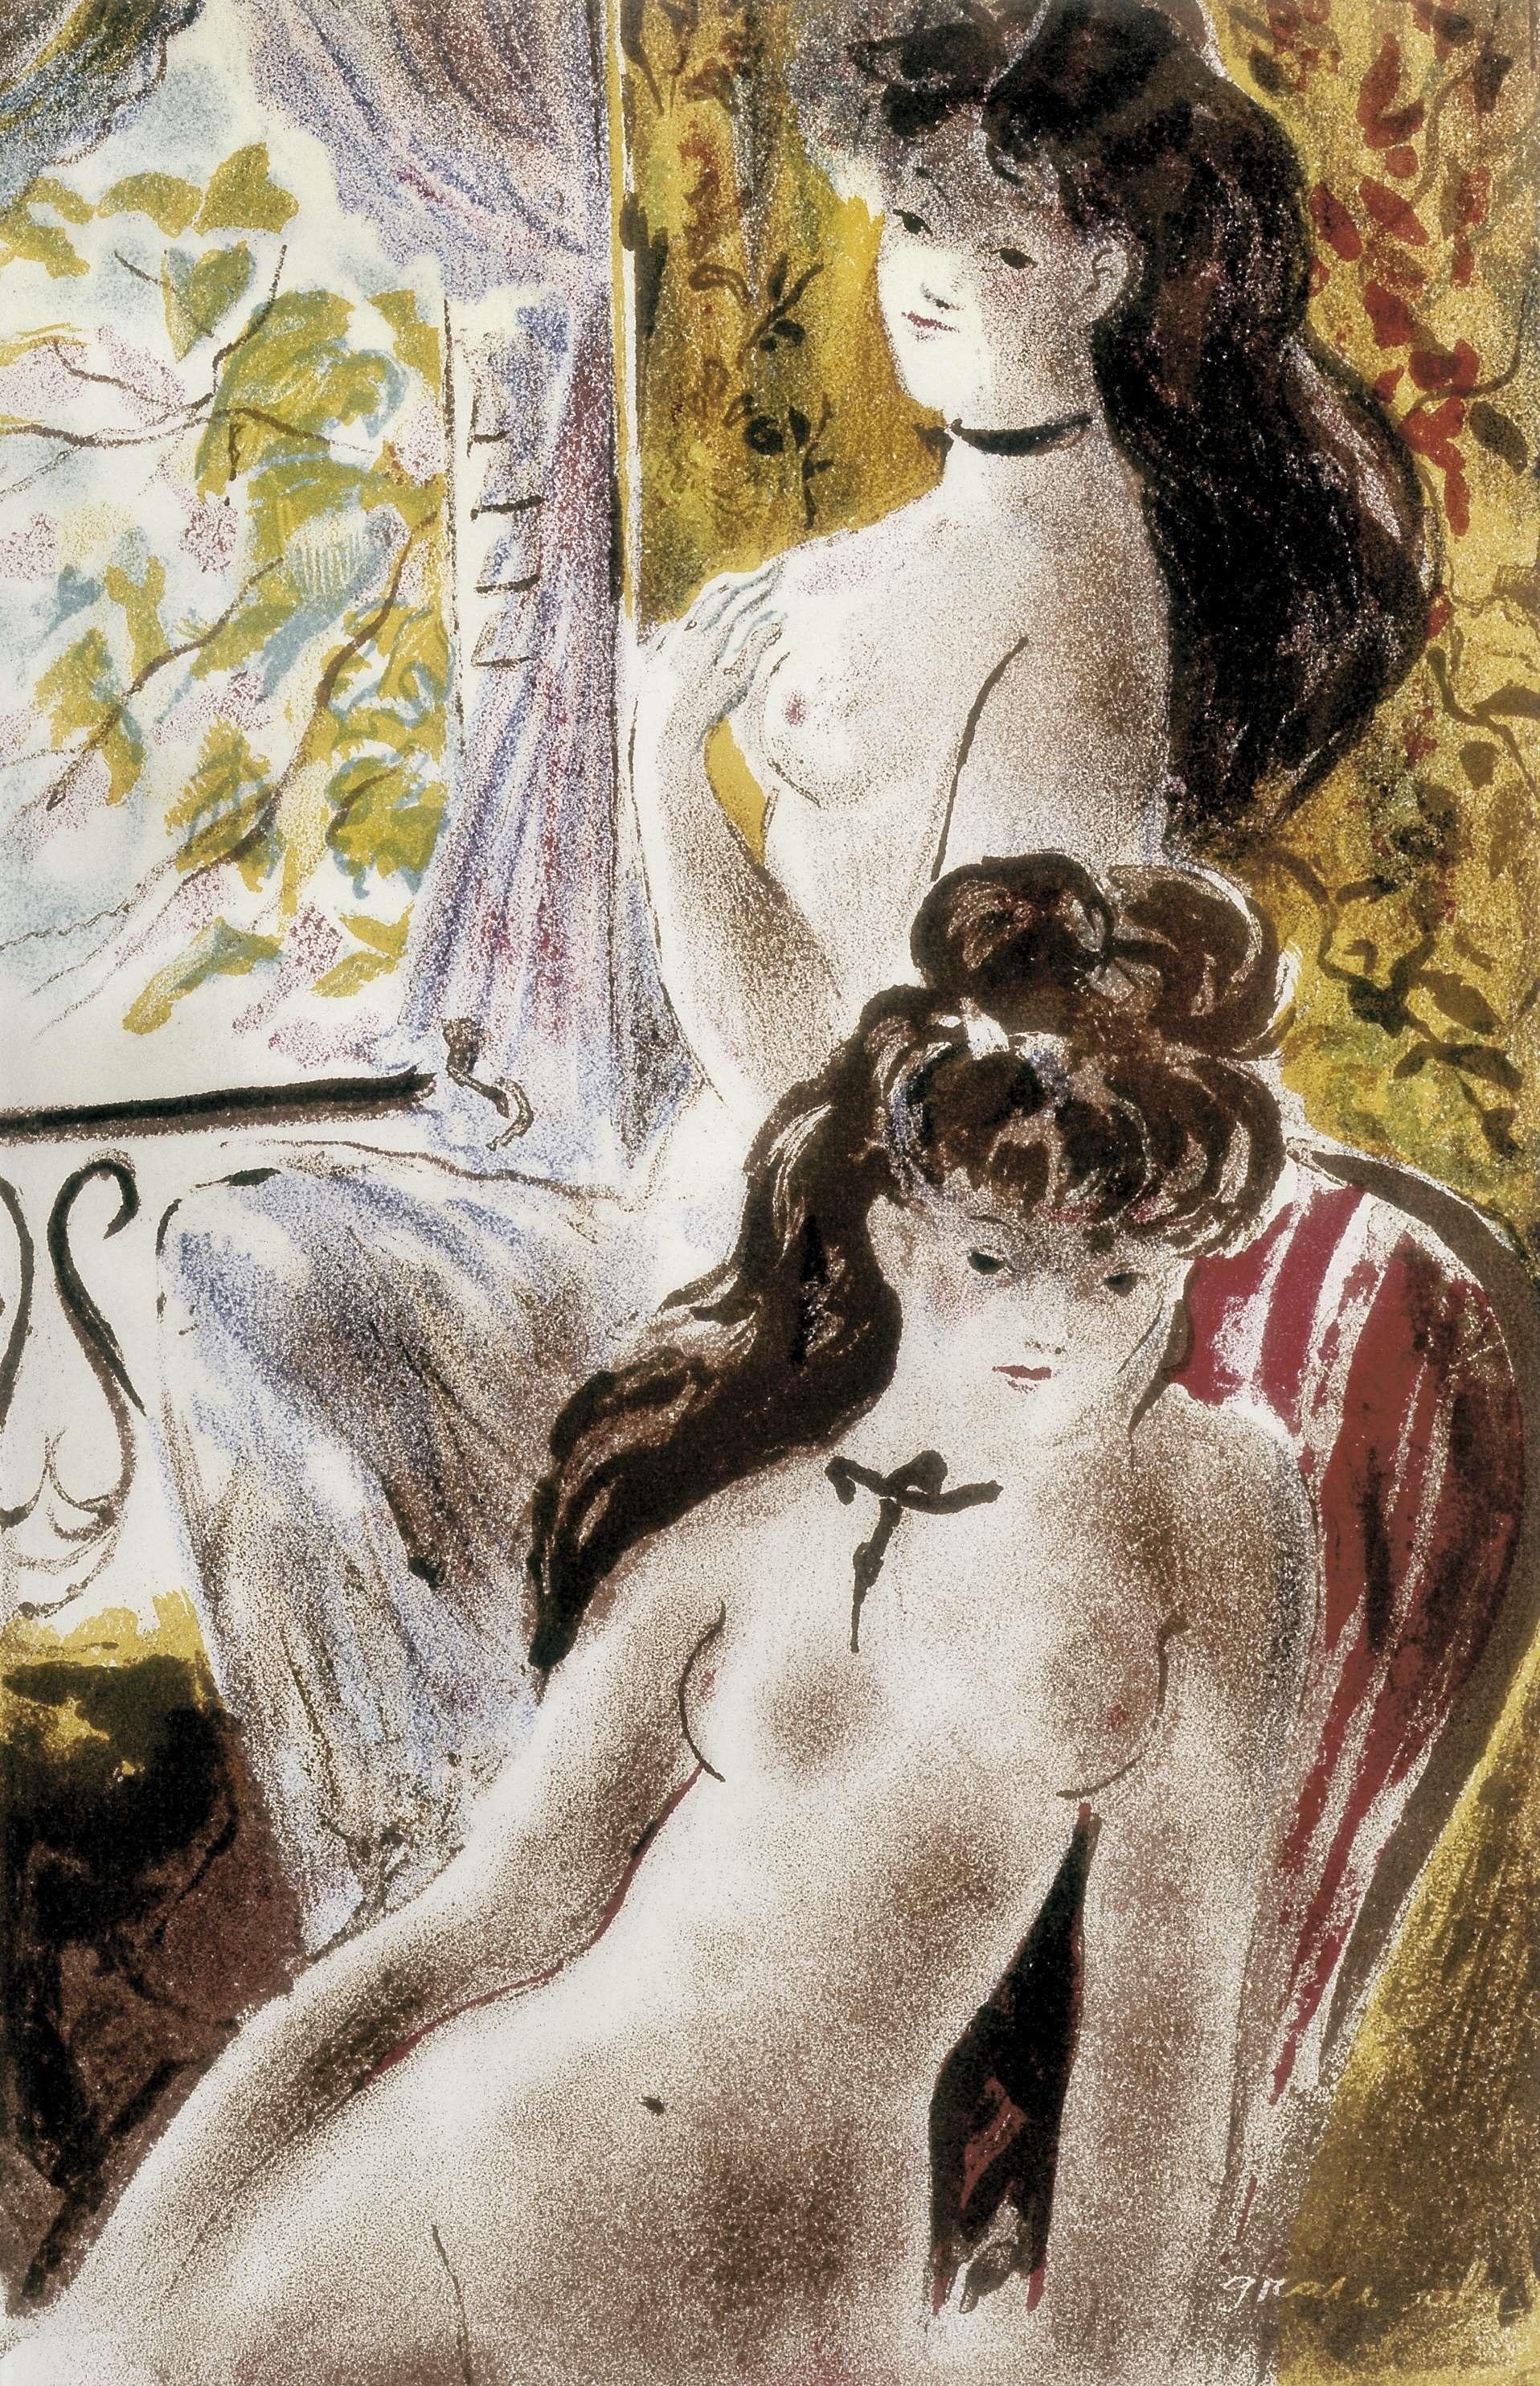 French symbolism, symbolist art, art critics, art movement, gallery, critic